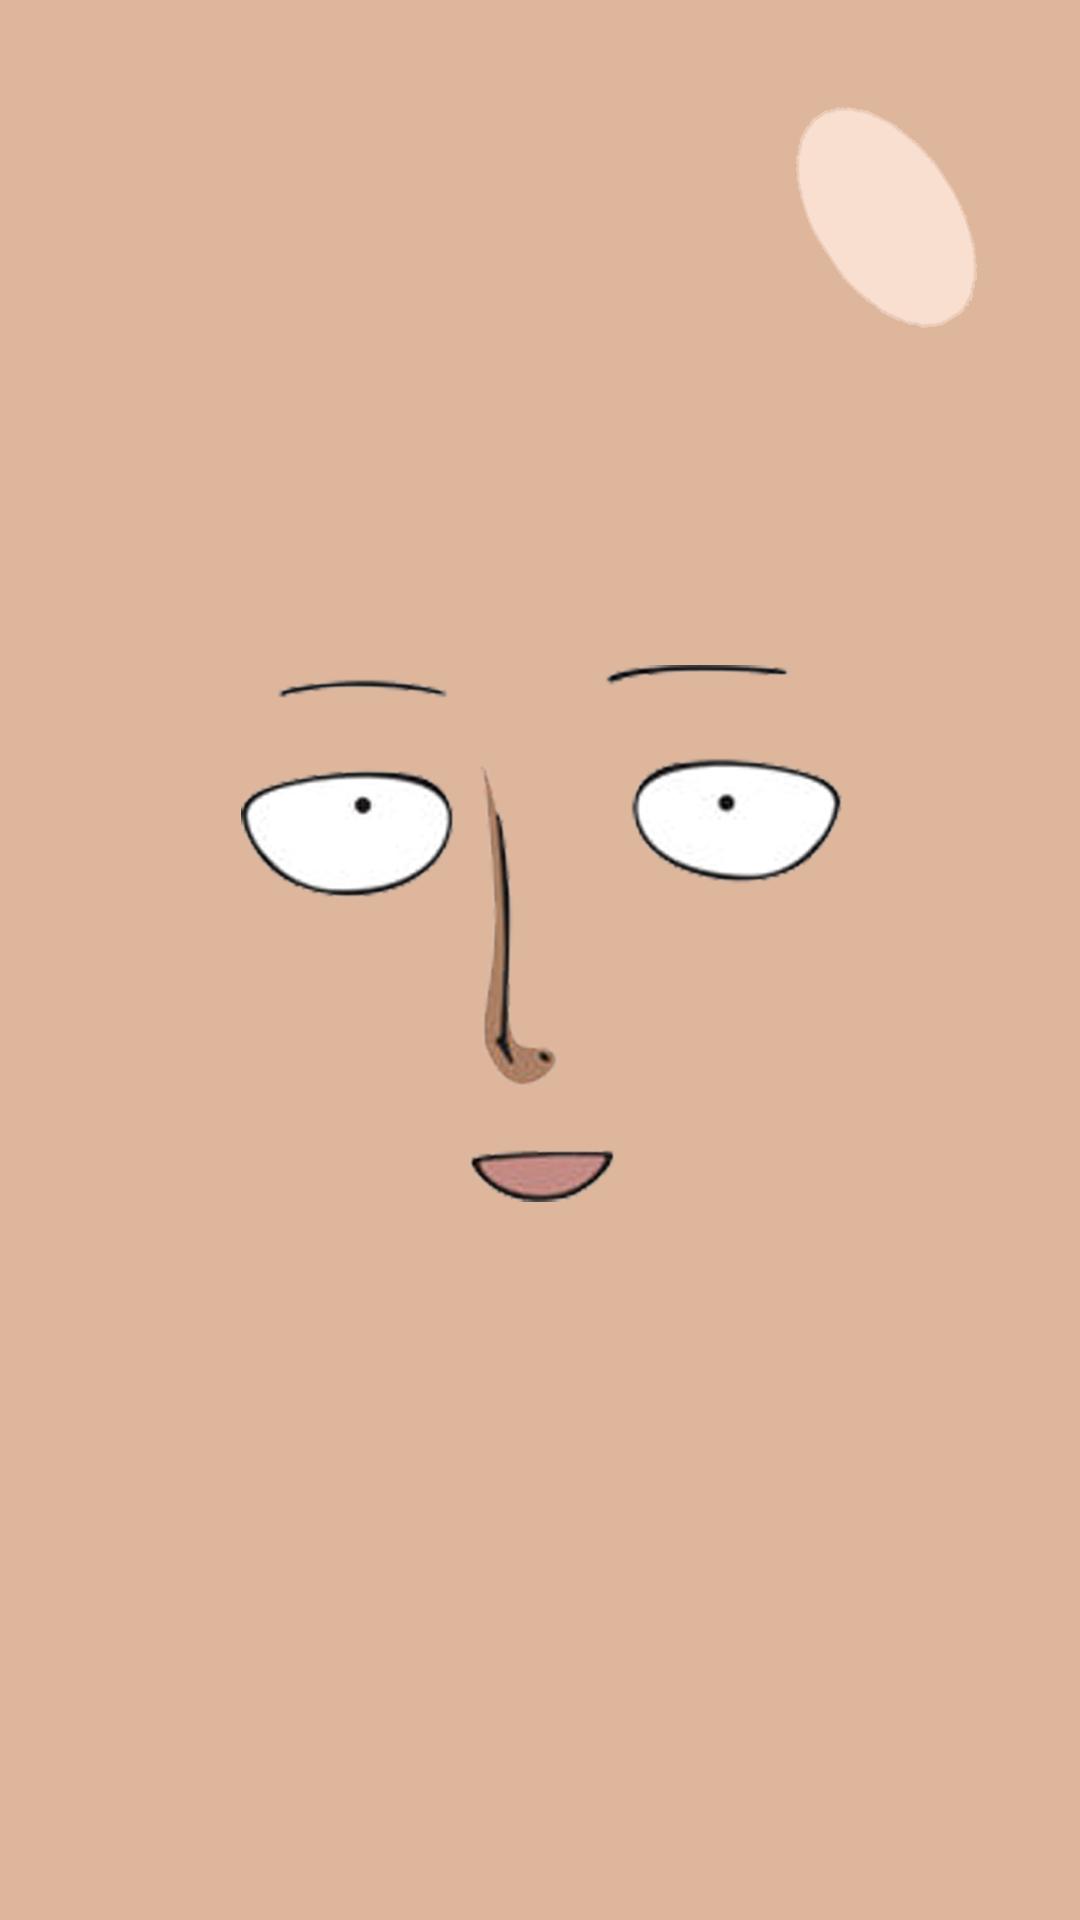 Saitama Face (iPhone 6) One punch man anime, Saitama one